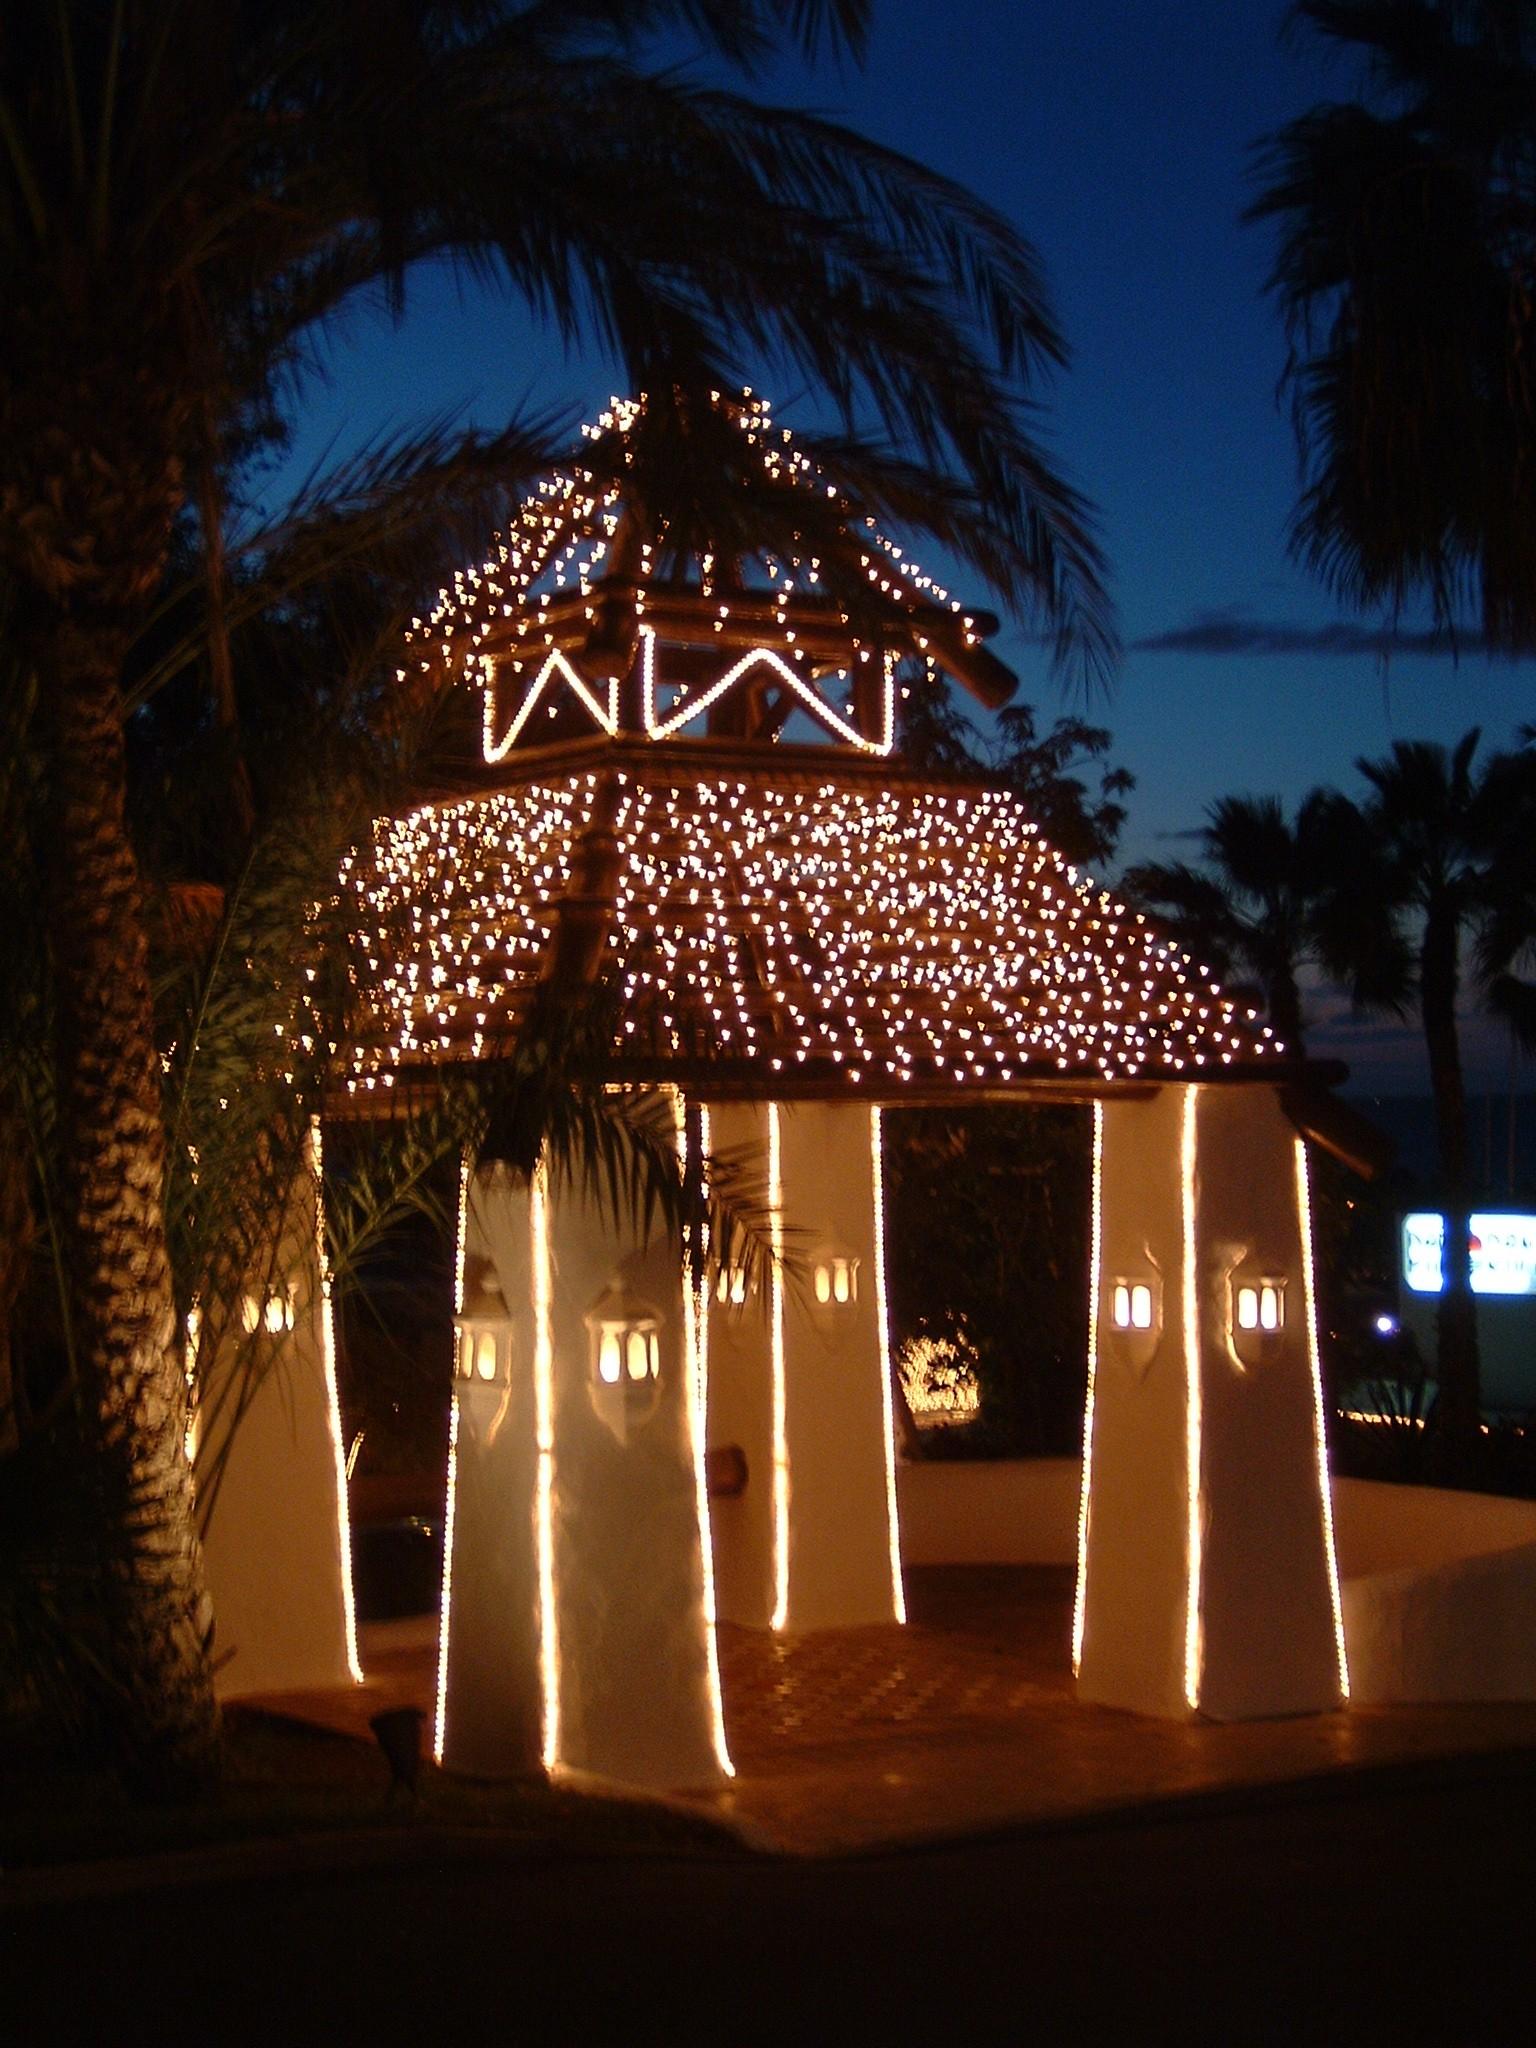 Nochevieja-2013-Hotel-Jardin-Tropical-Tenerife-Sur – Blog De ... concernant Jardin Tropical Tenerife